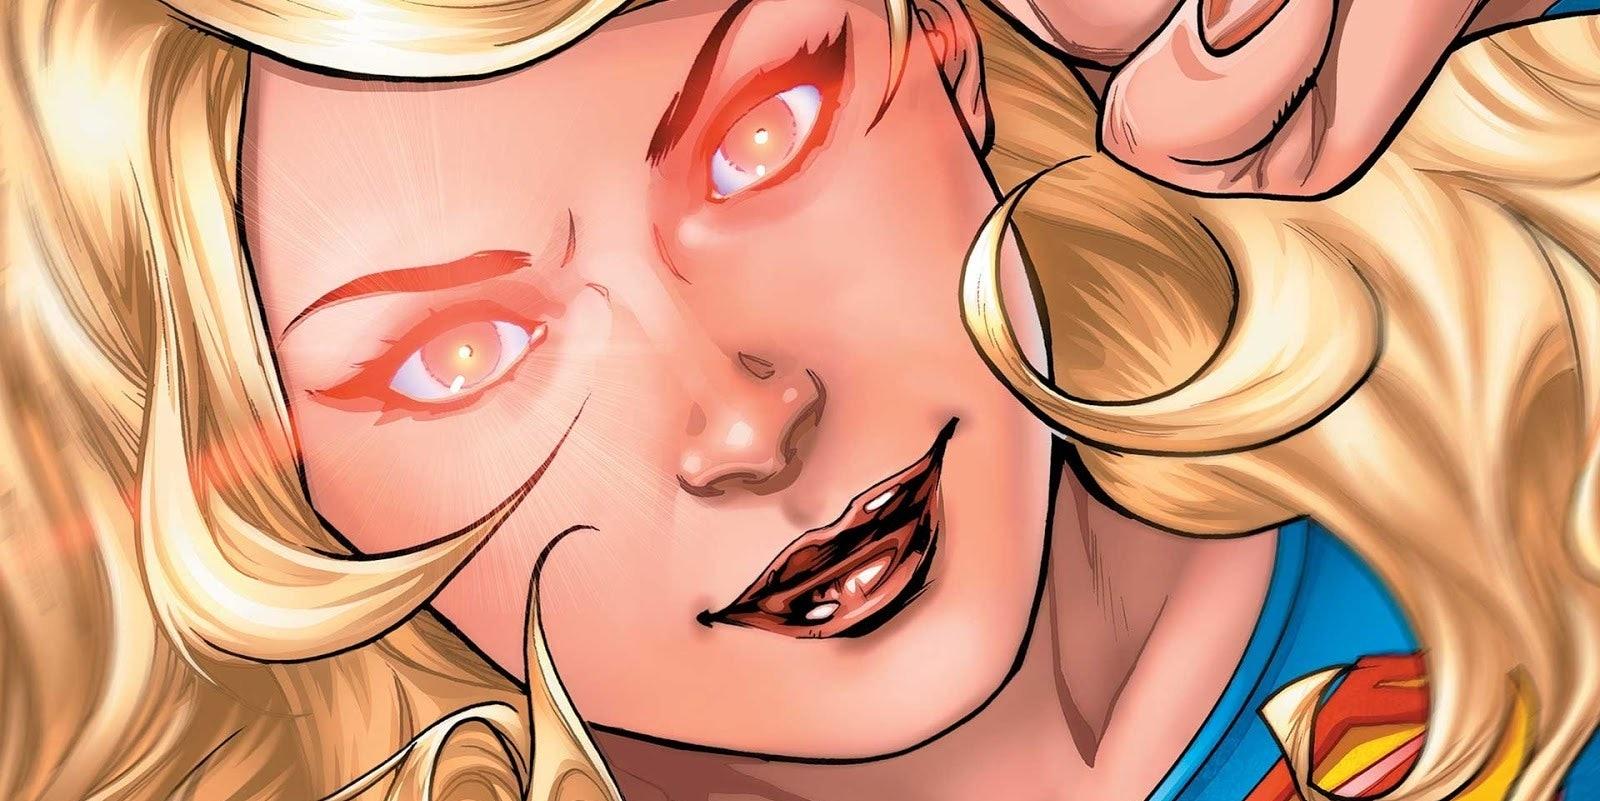 The Best DC Comics 'Rebirth' Playlists on Spotify